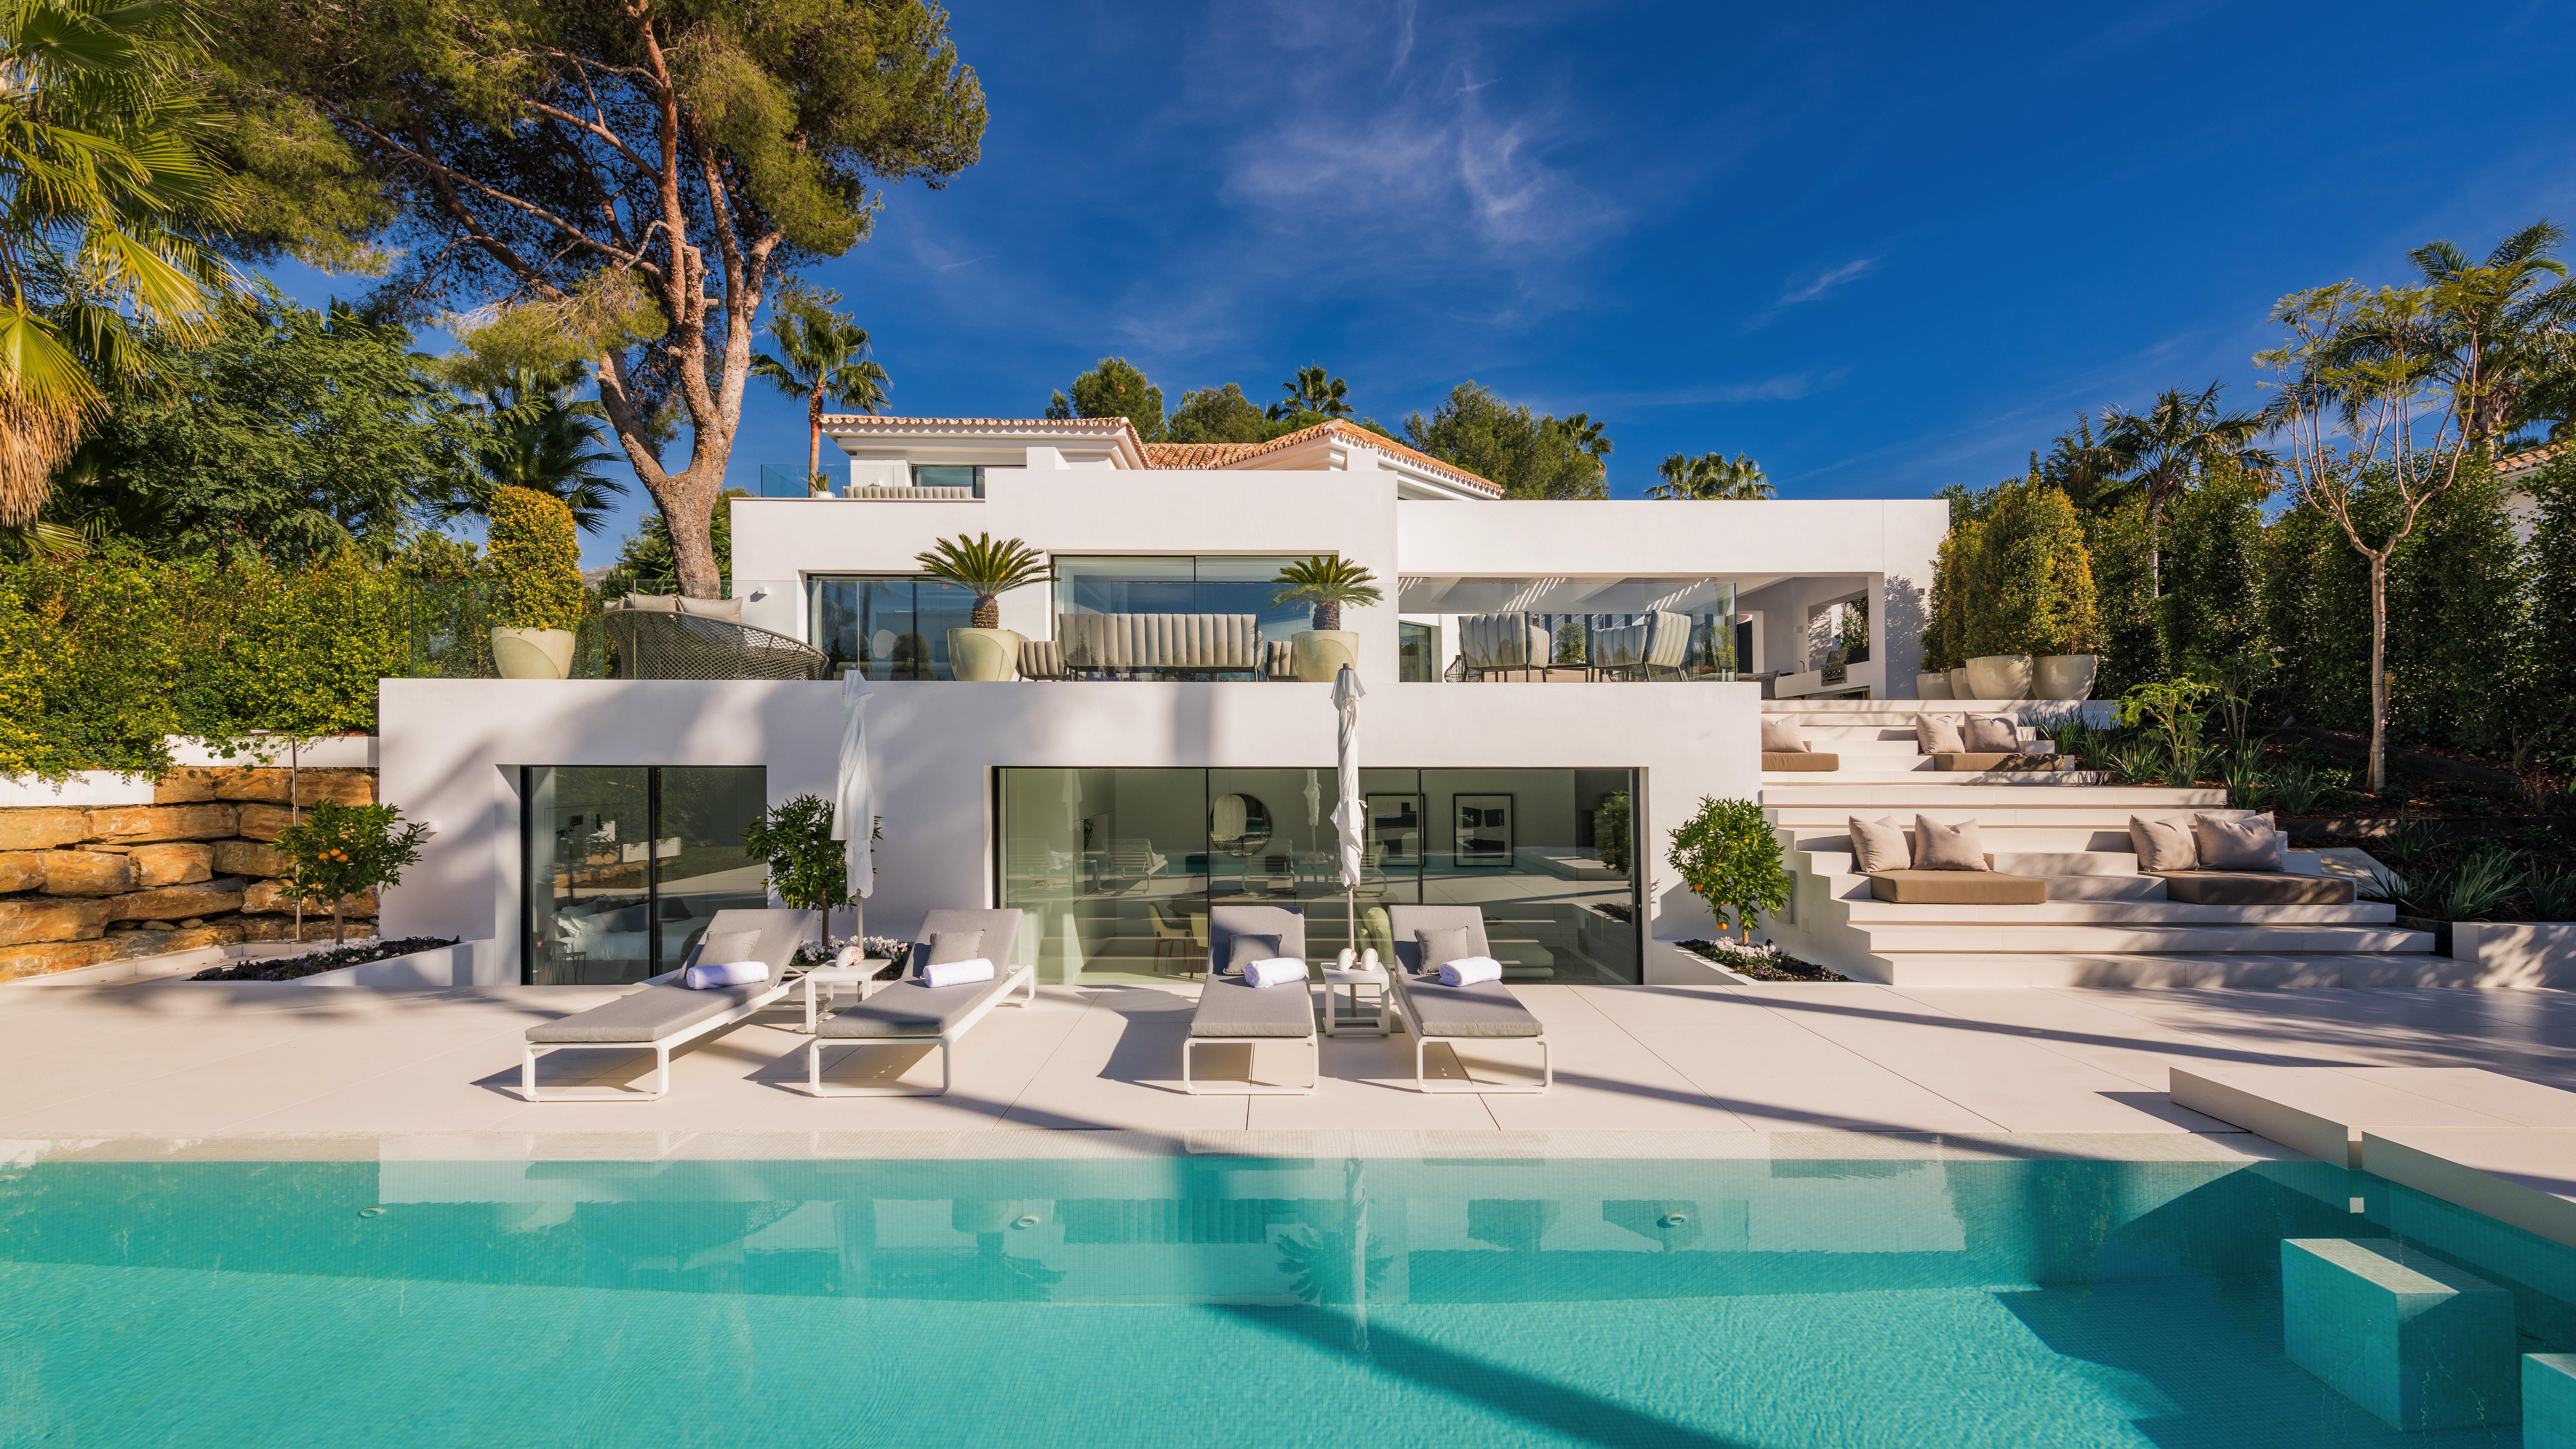 359-00117P: Villa in Marbella